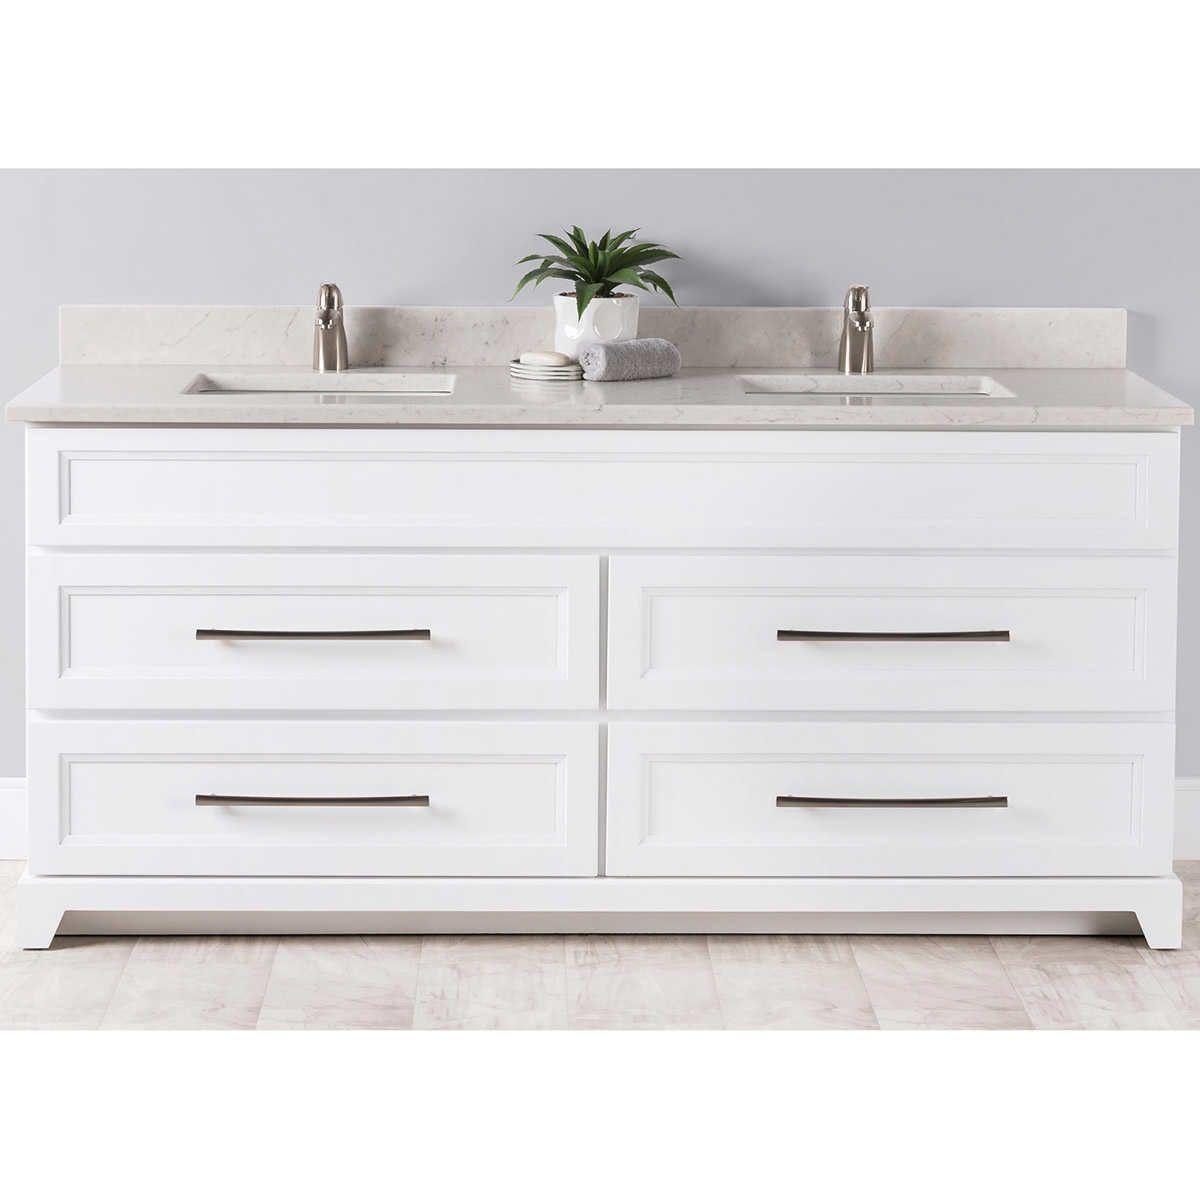 White Vanity, Quartz Countertops, Countertops